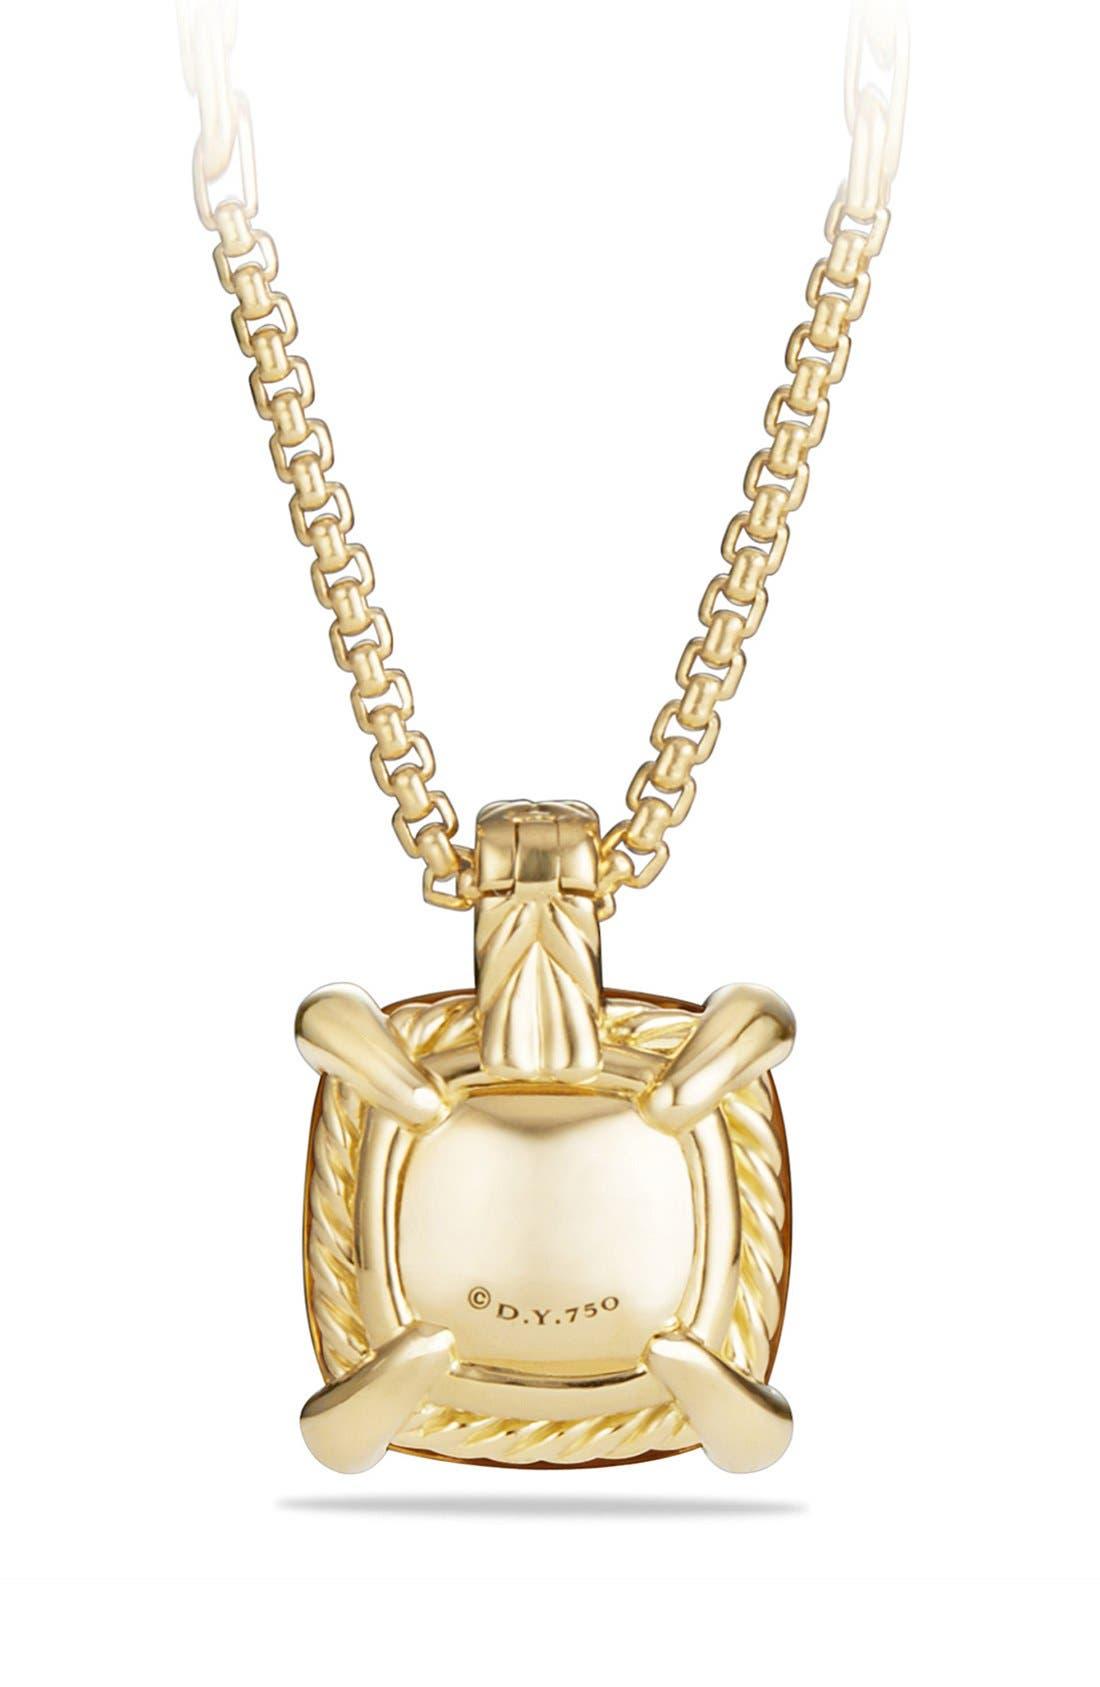 'Châtelaine' Pendant Necklace with Diamonds in 18K Gold,                             Alternate thumbnail 4, color,                             HAMPTON BLUE TOPAZ